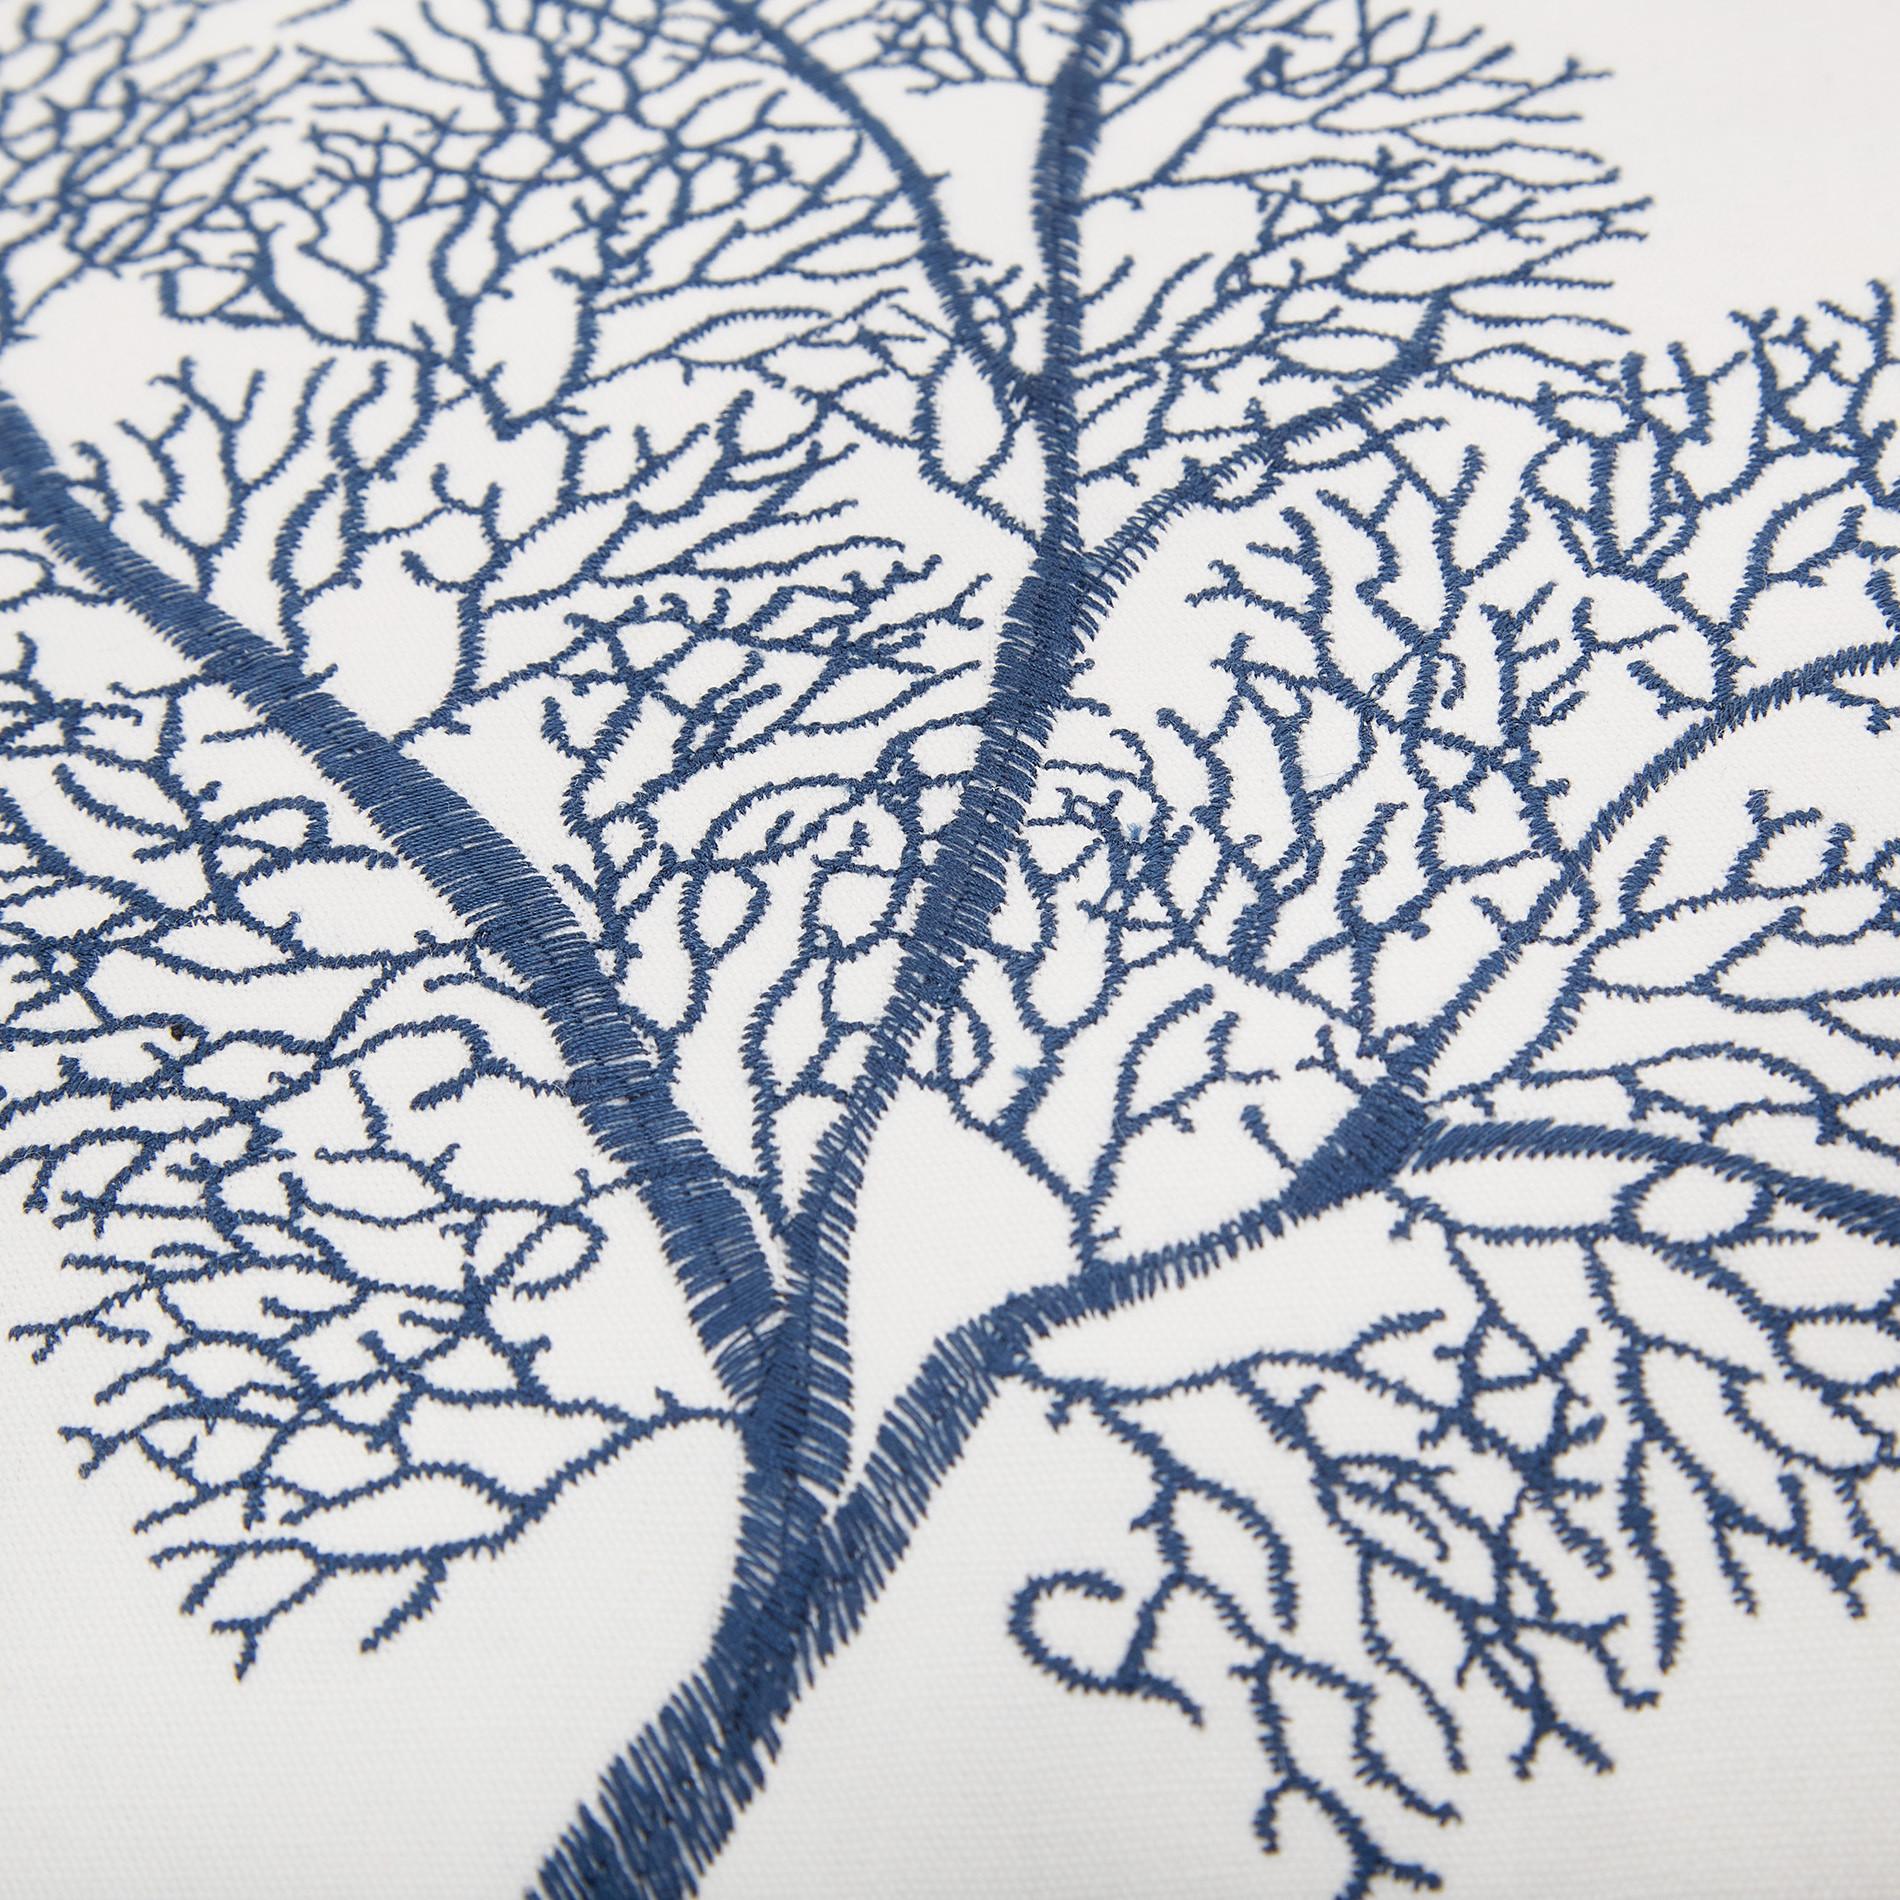 Cuscino ricamo corallo 45x45cm, Blu scuro, large image number 3